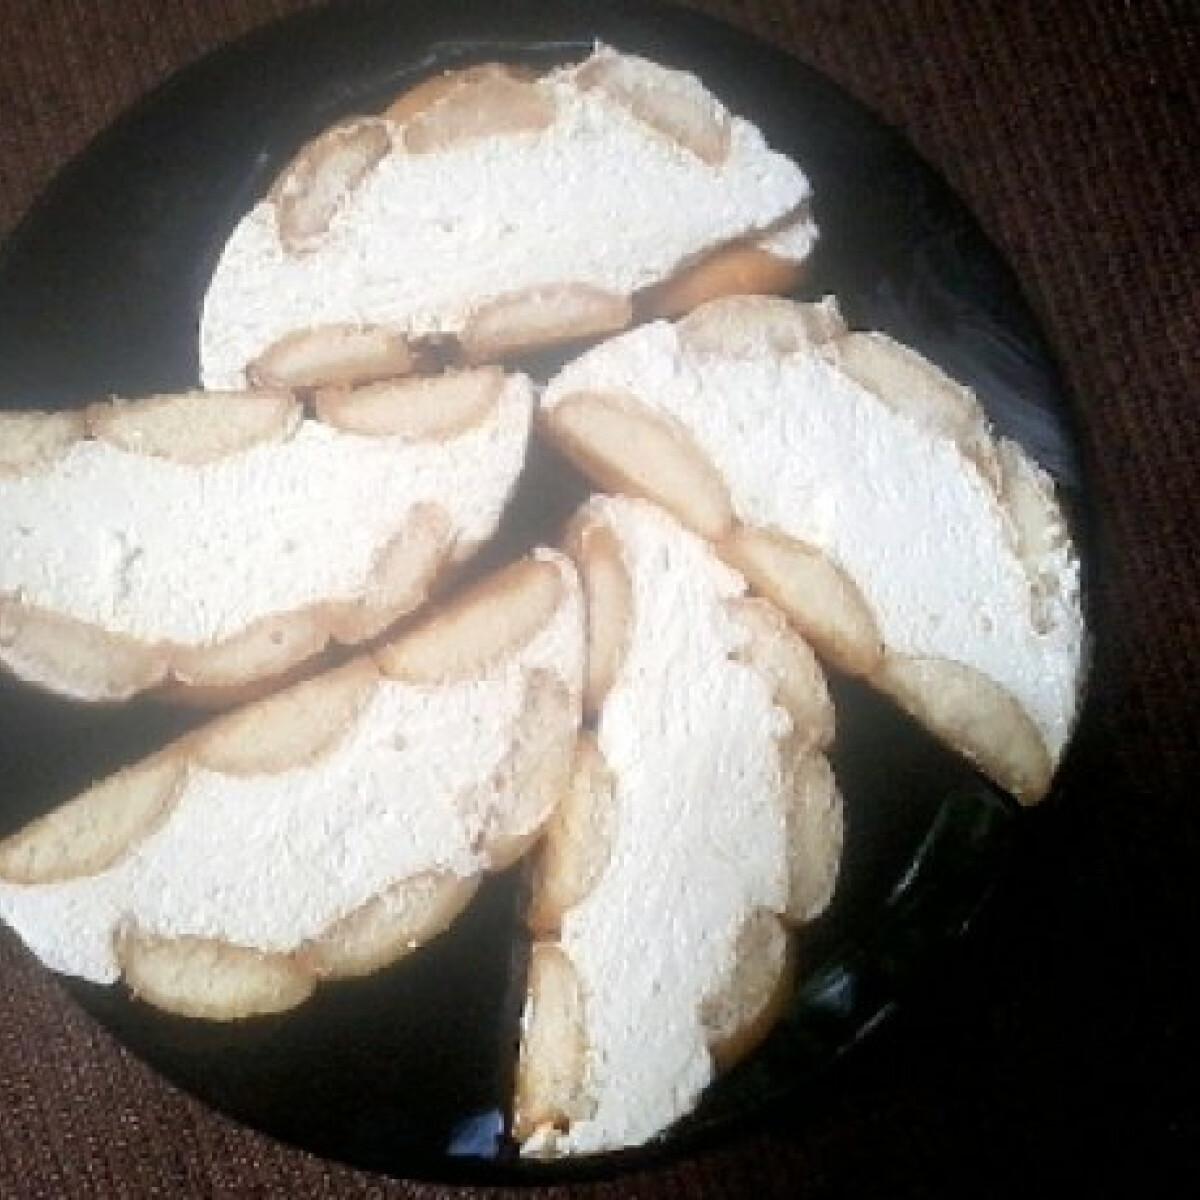 Citromos-joghurtos őzgerinc